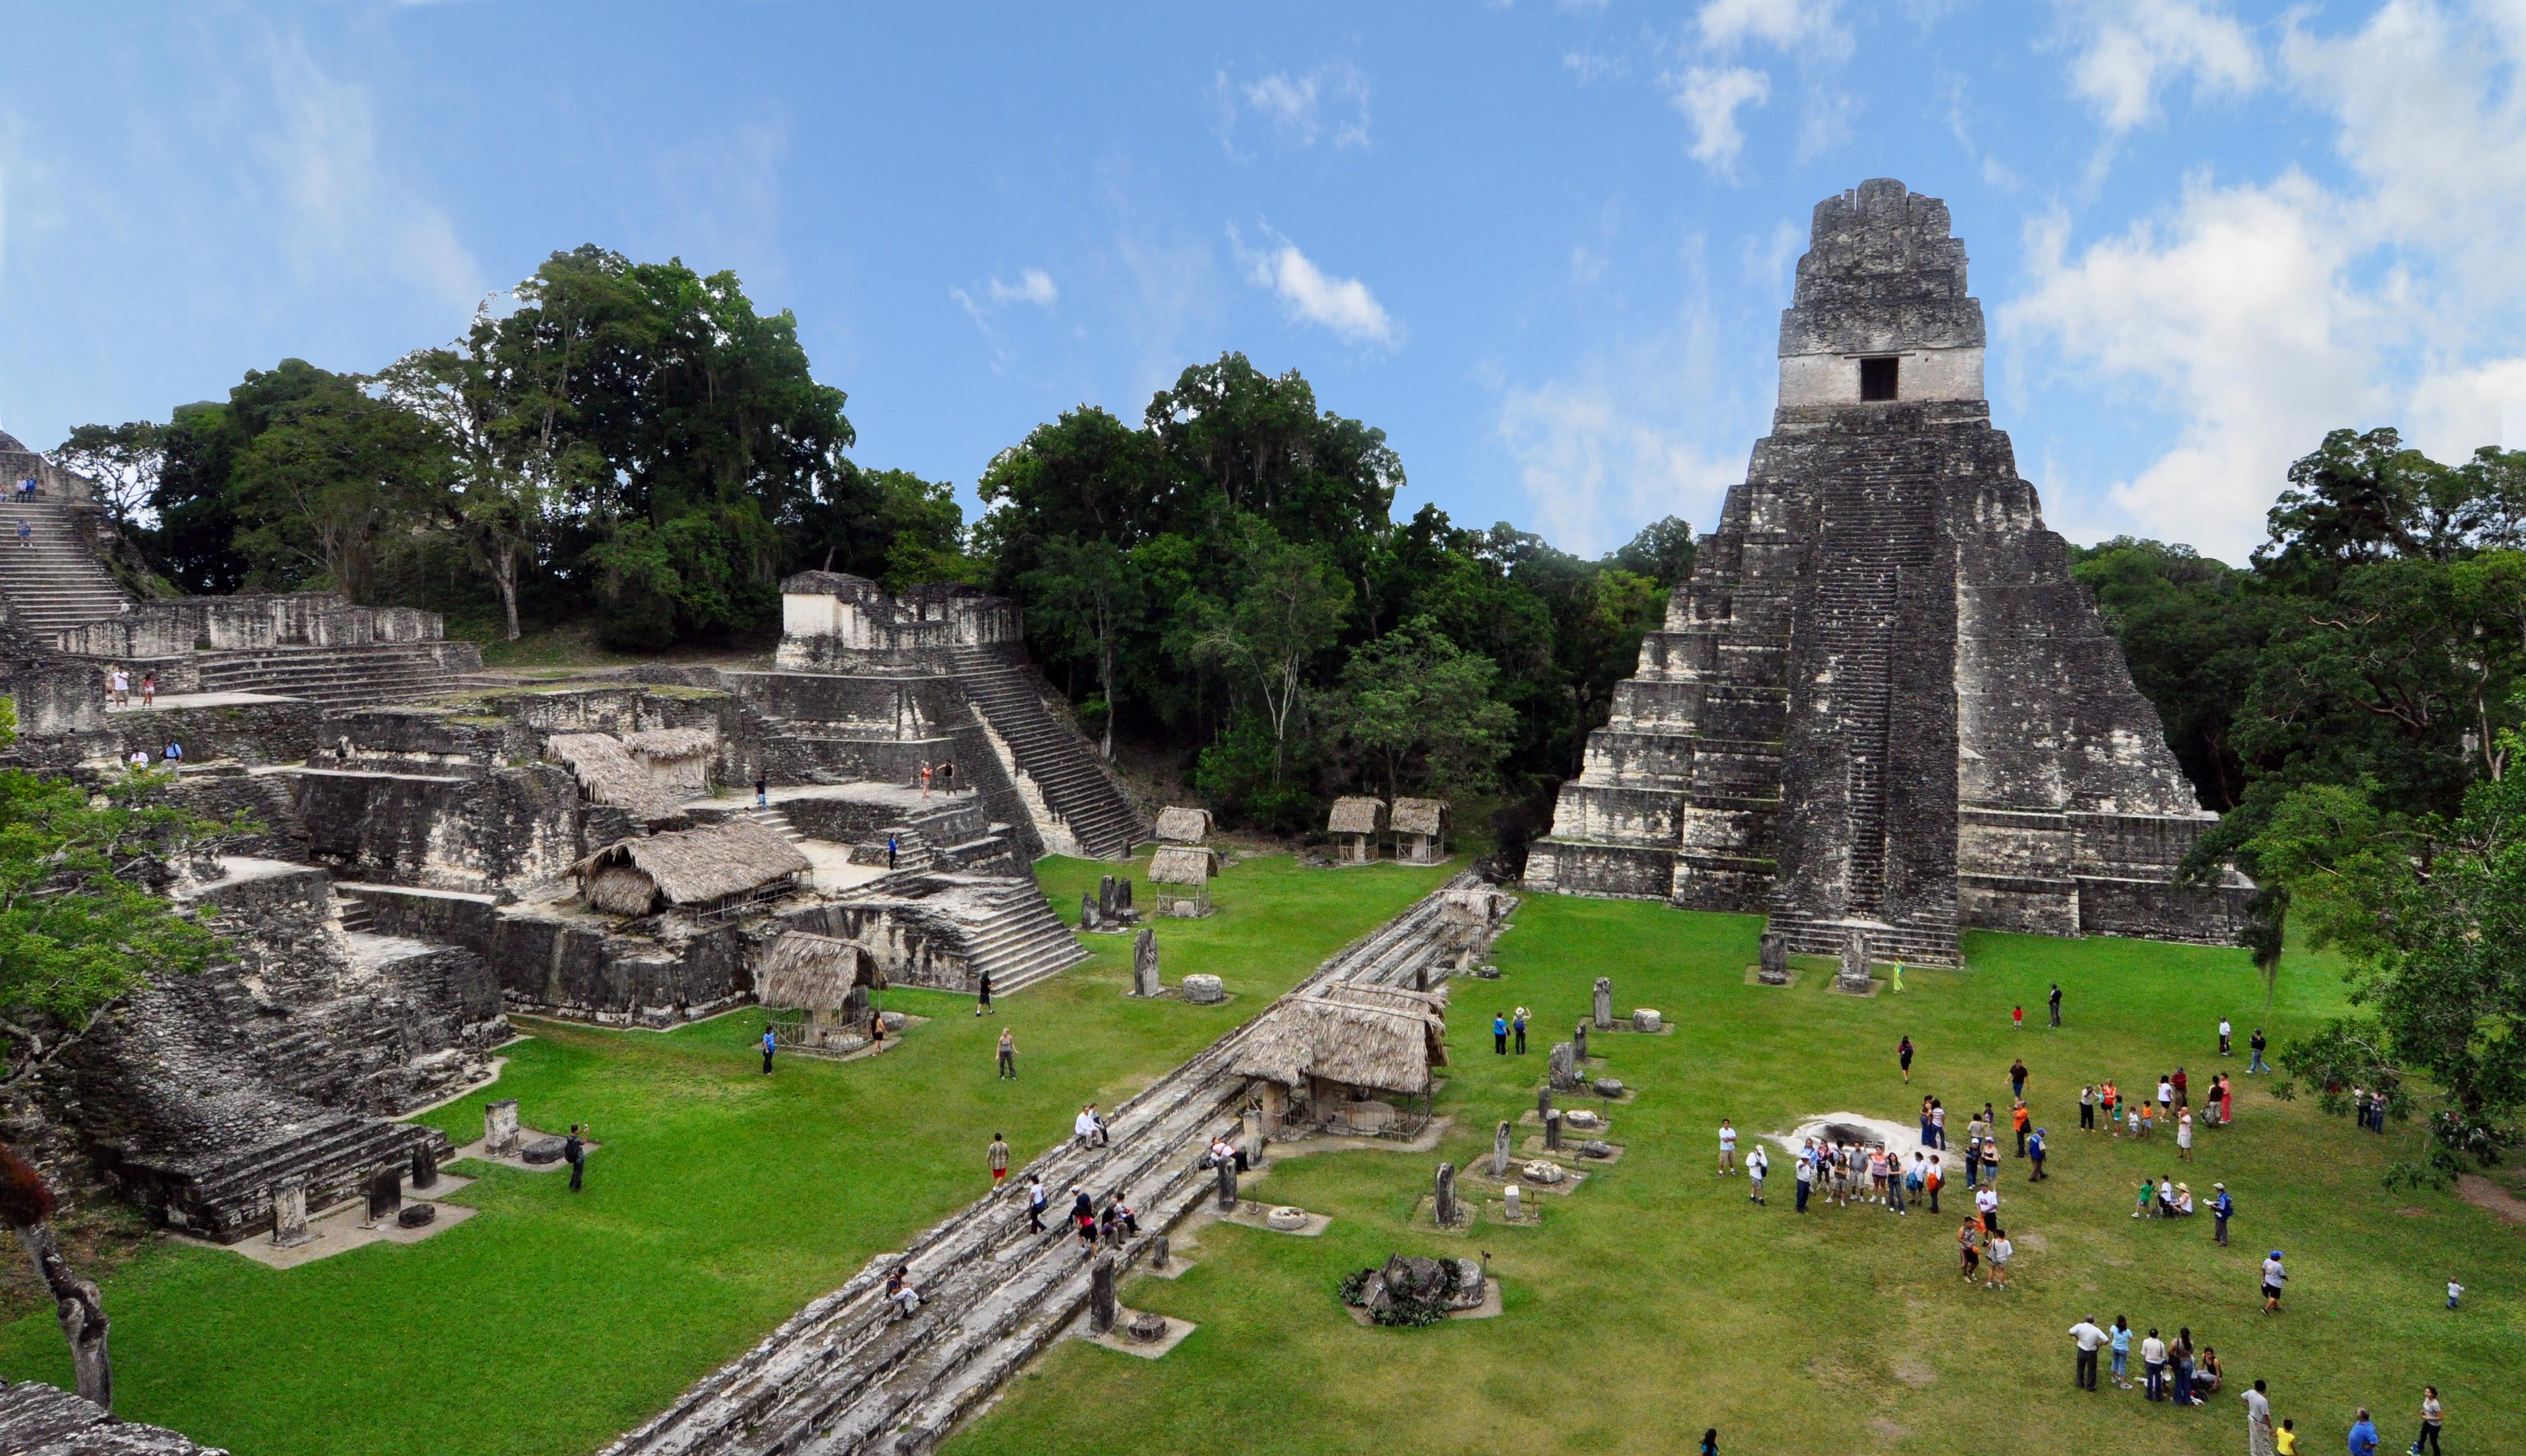 http://upload.wikimedia.org/wikipedia/commons/e/e7/Tikal_mayan_ruins_2009.jpg